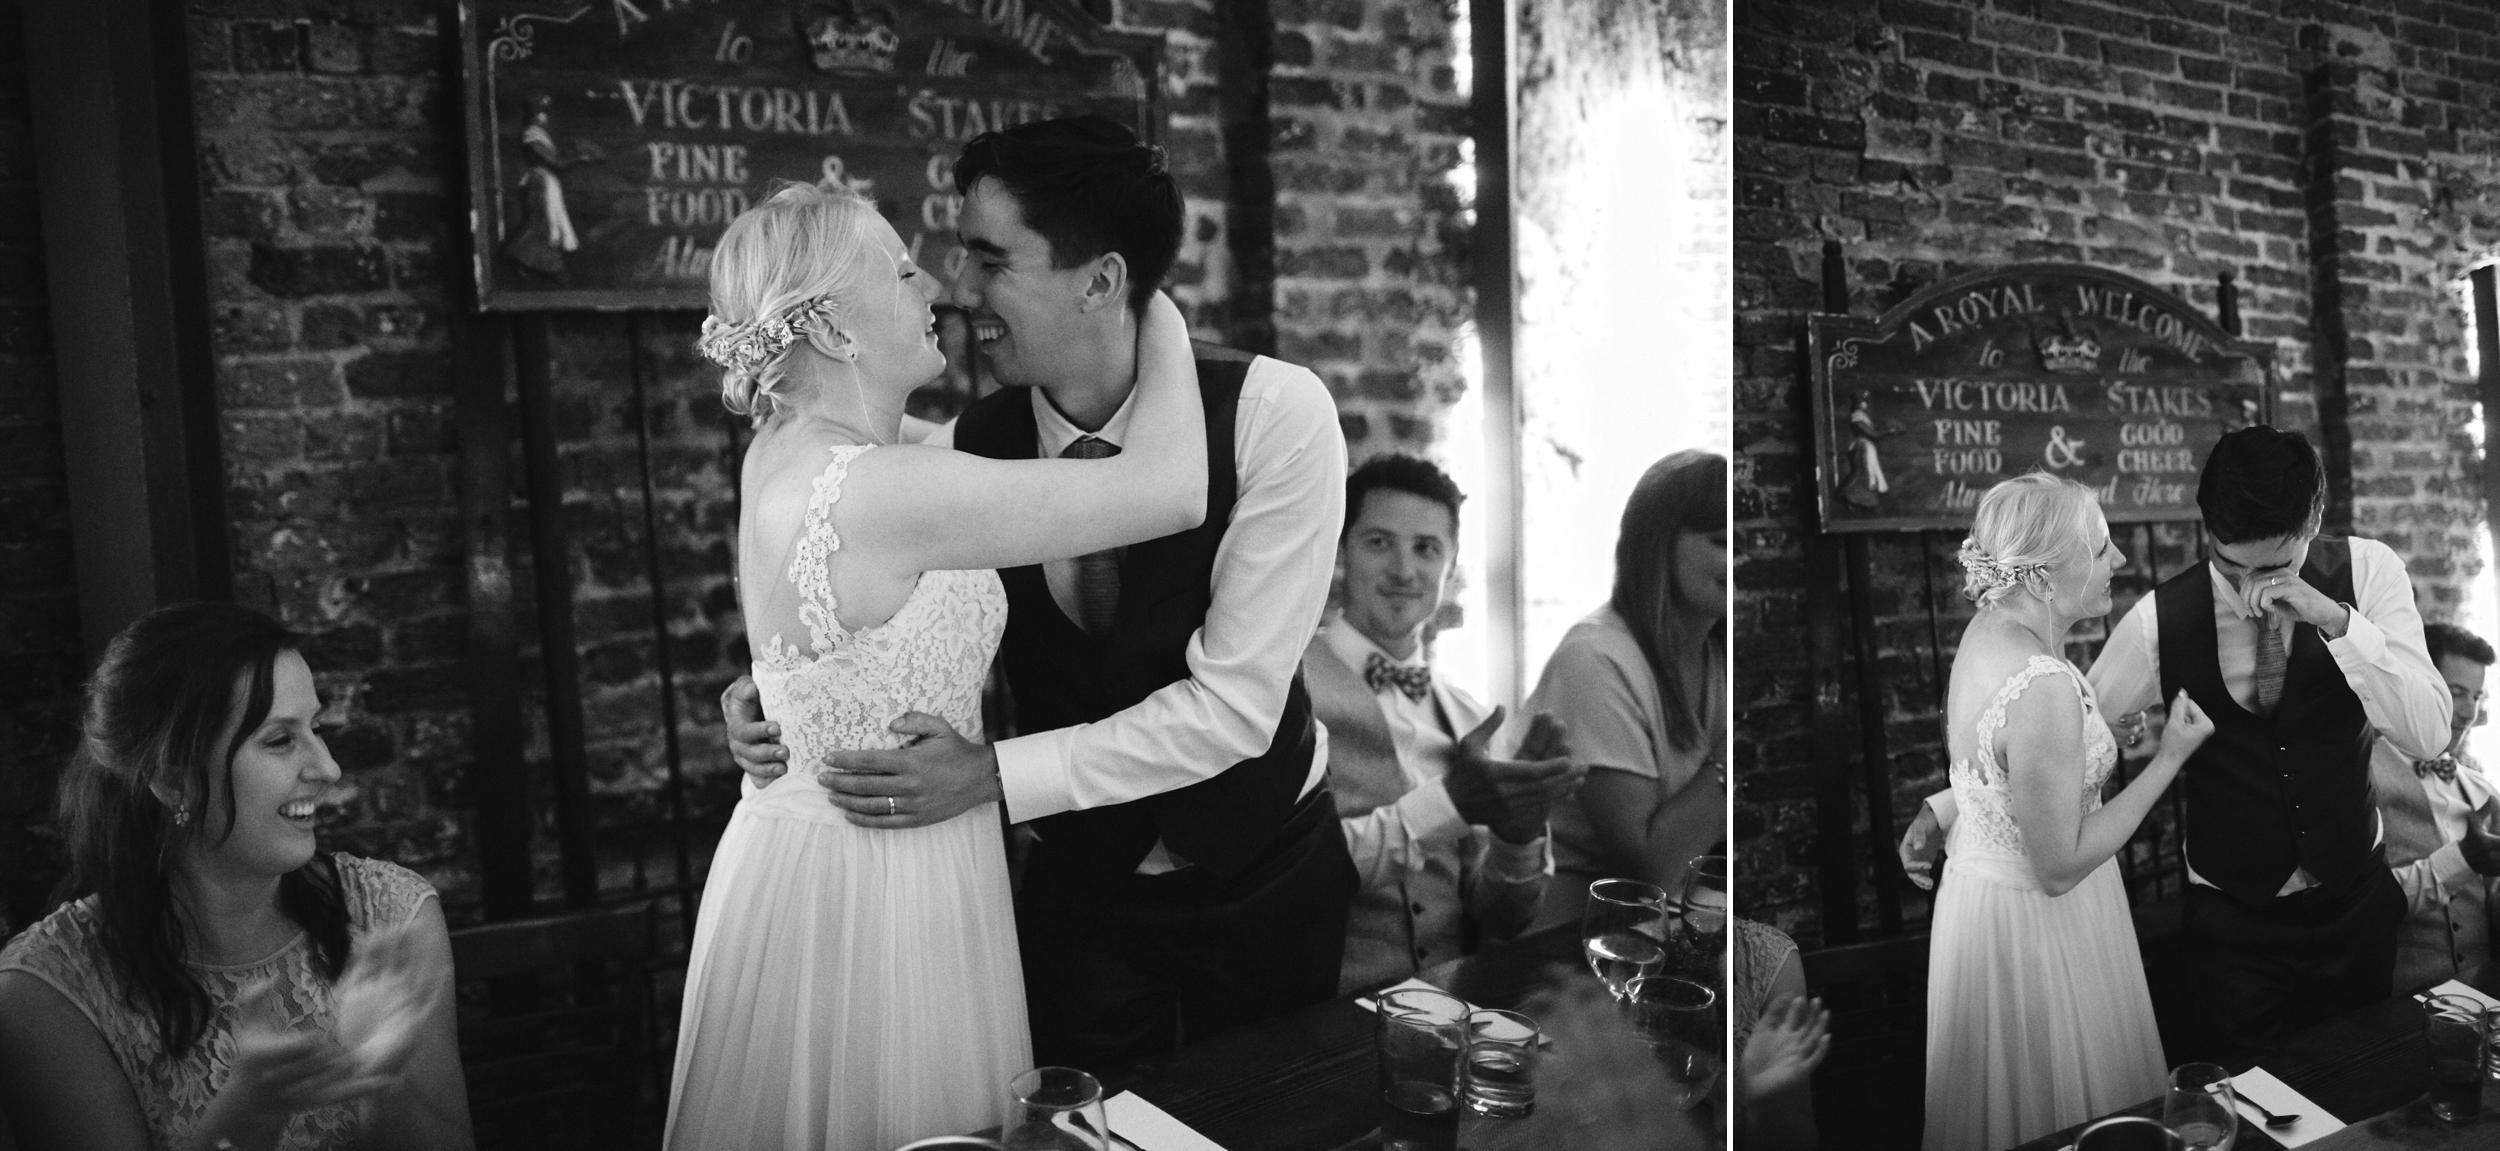 Wedding in London - Echoes & Wild Hearts 0059.jpg